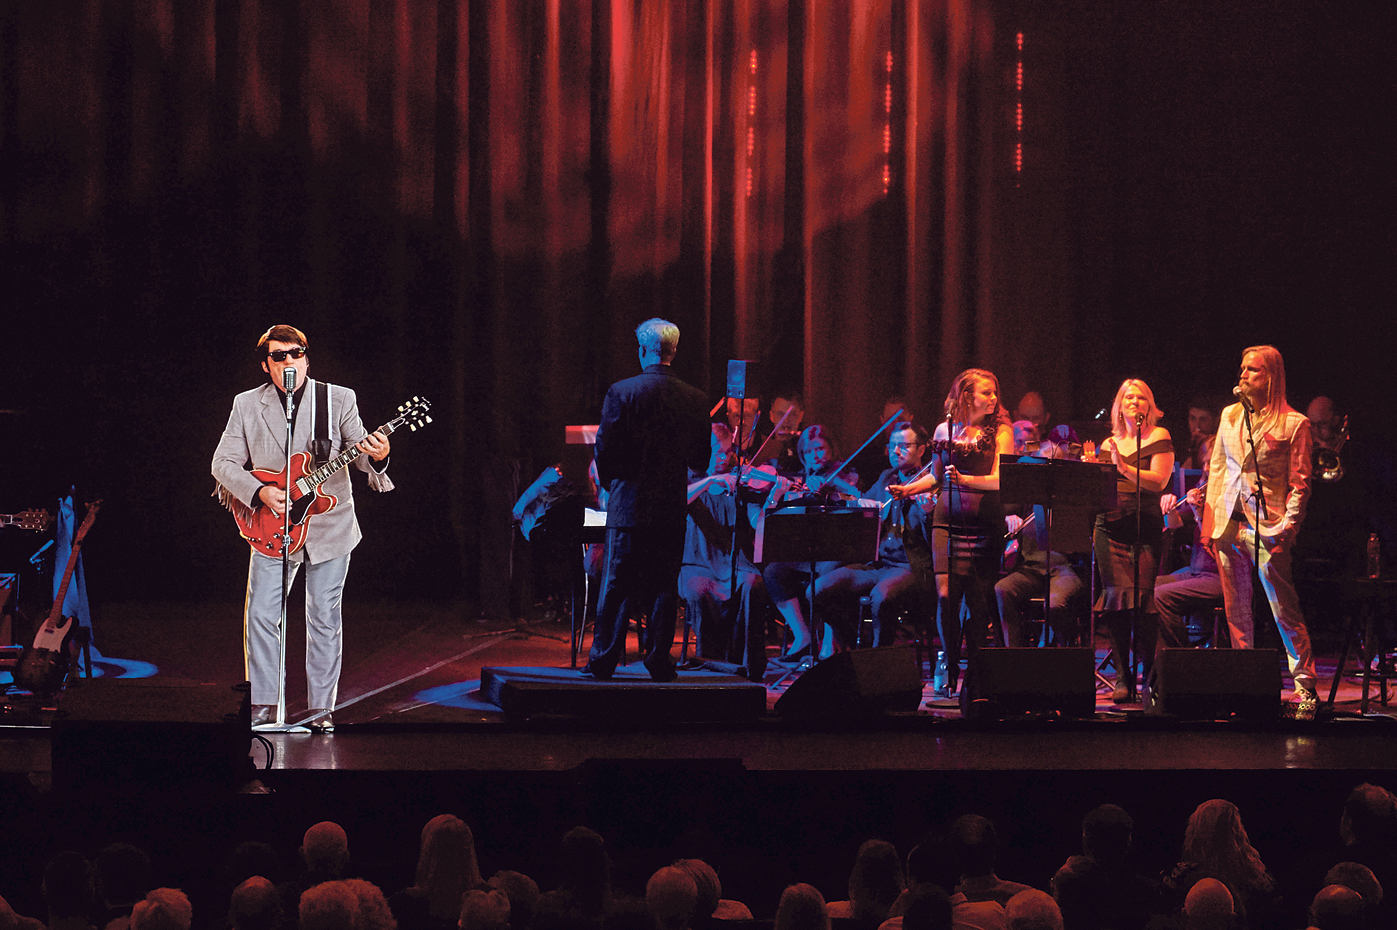 Hologramski koncert Roya Orbisona. Londonu 2018. bio je jedna od etapa njegove velike turneje